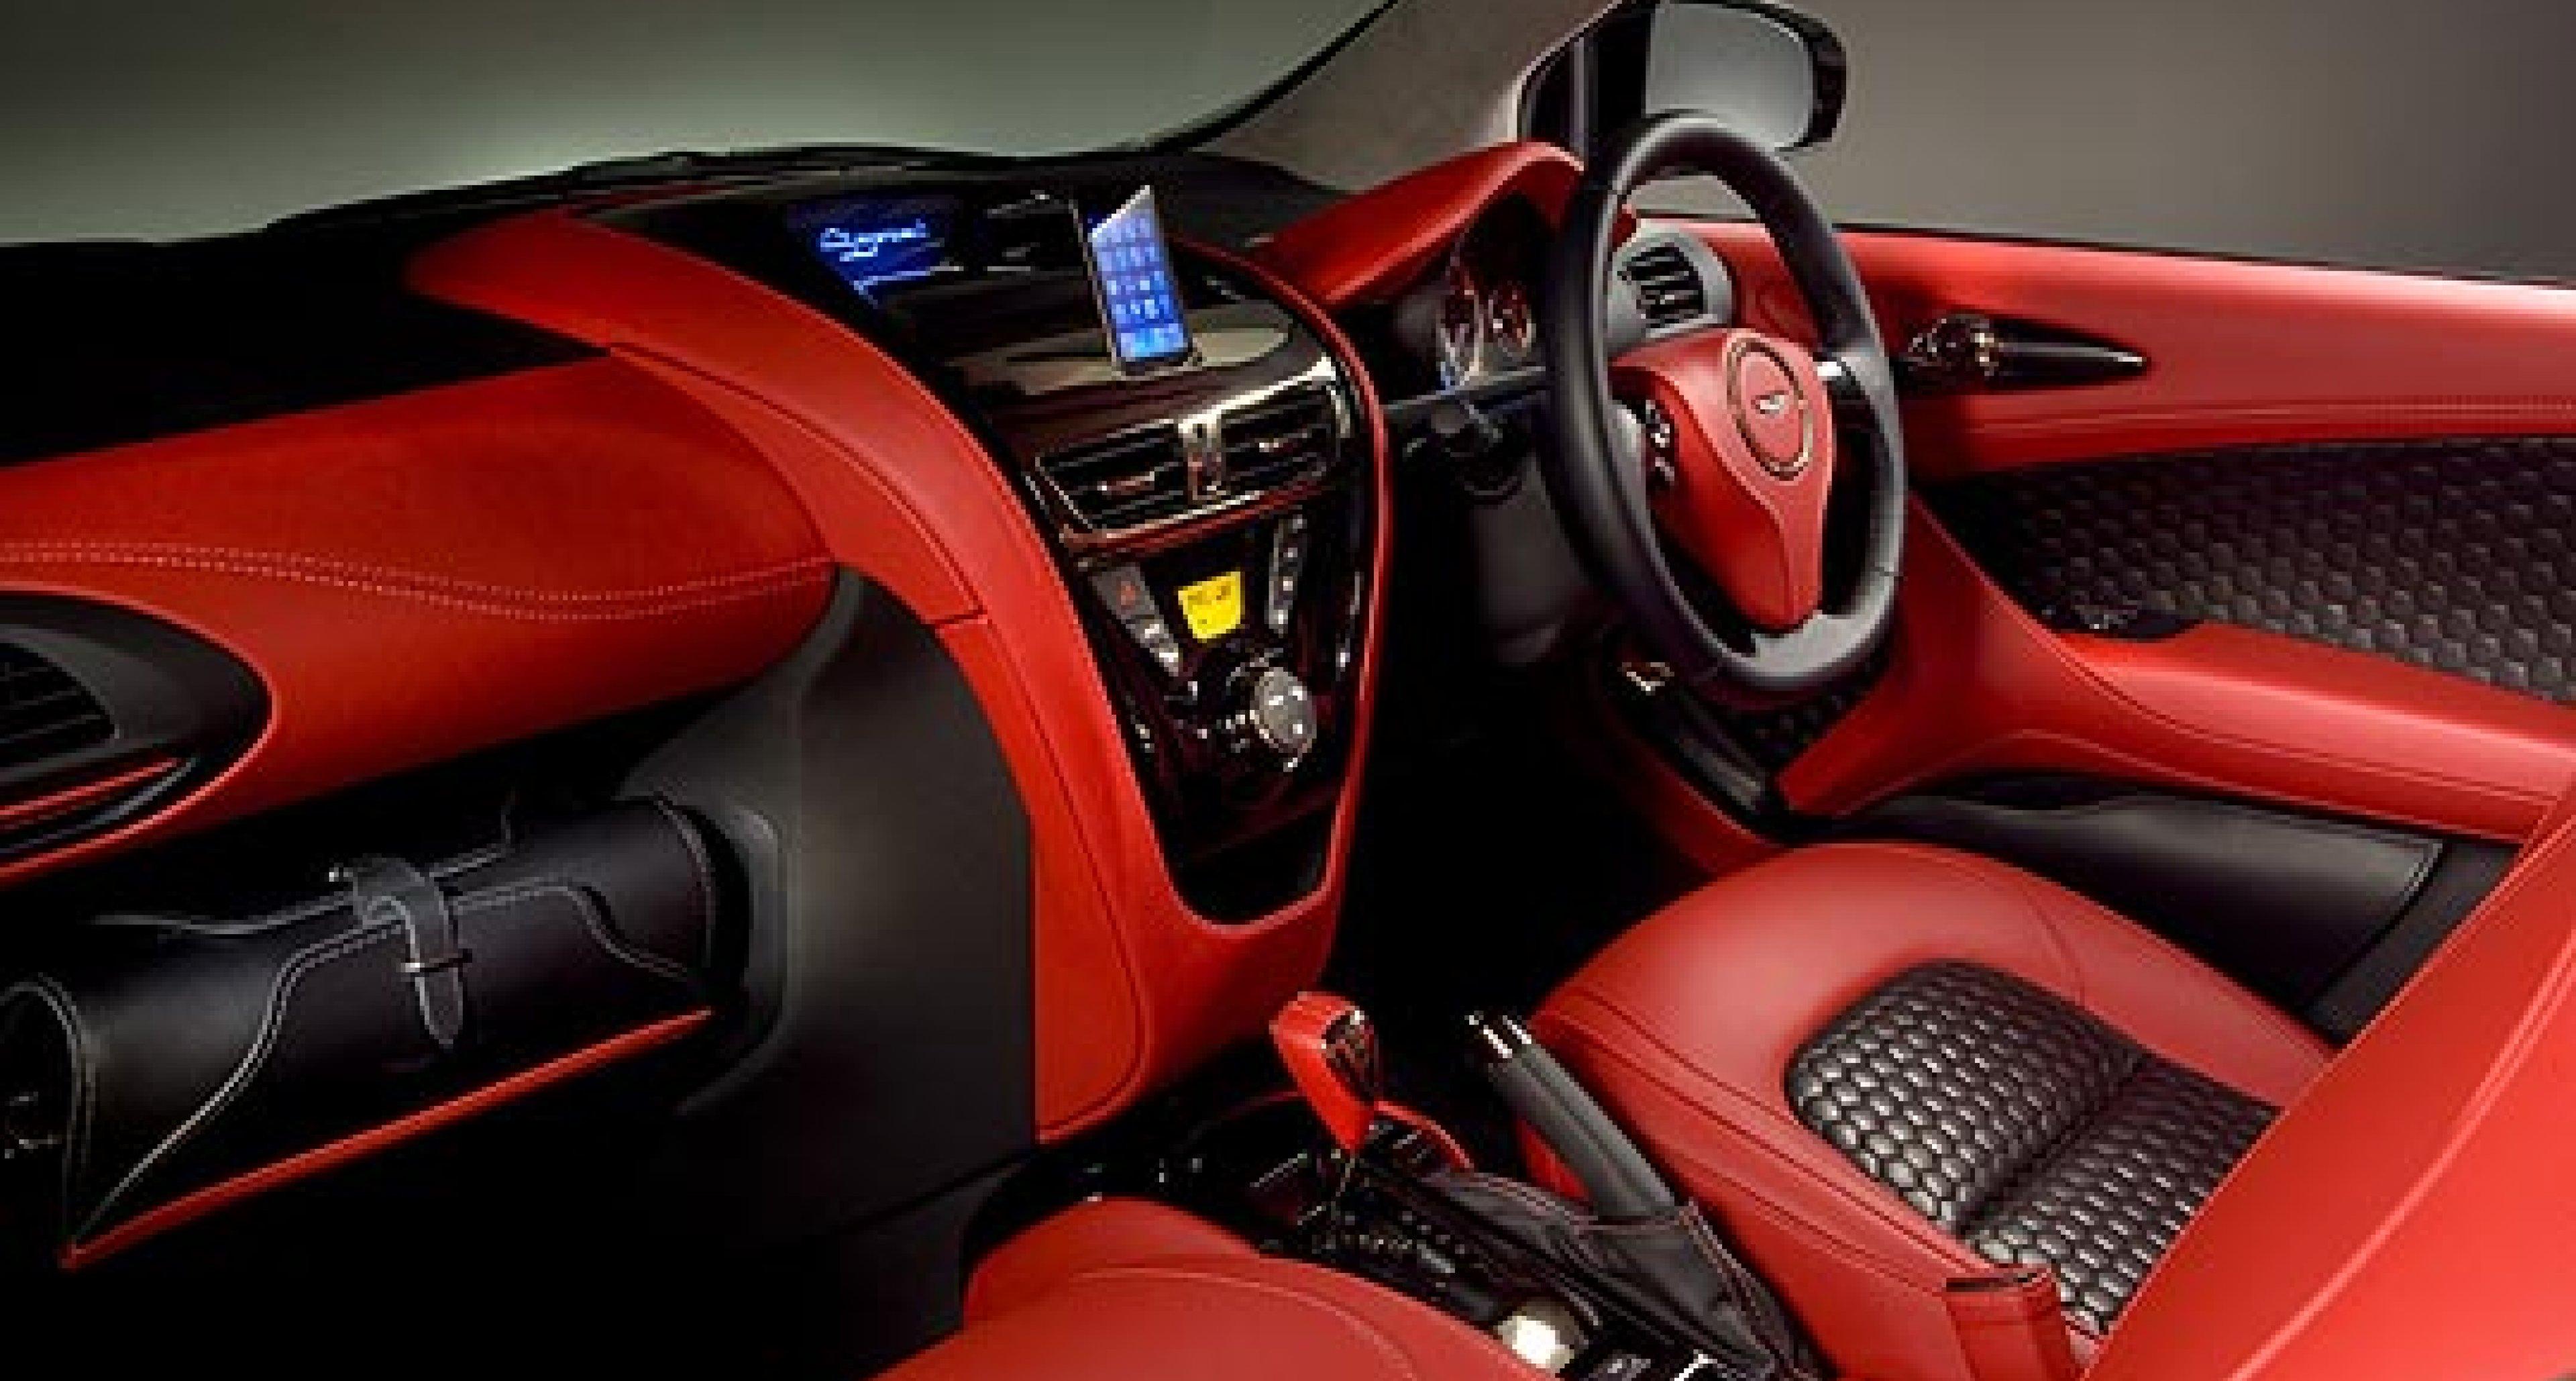 Aston Martin Cygnet: Now in the Metal